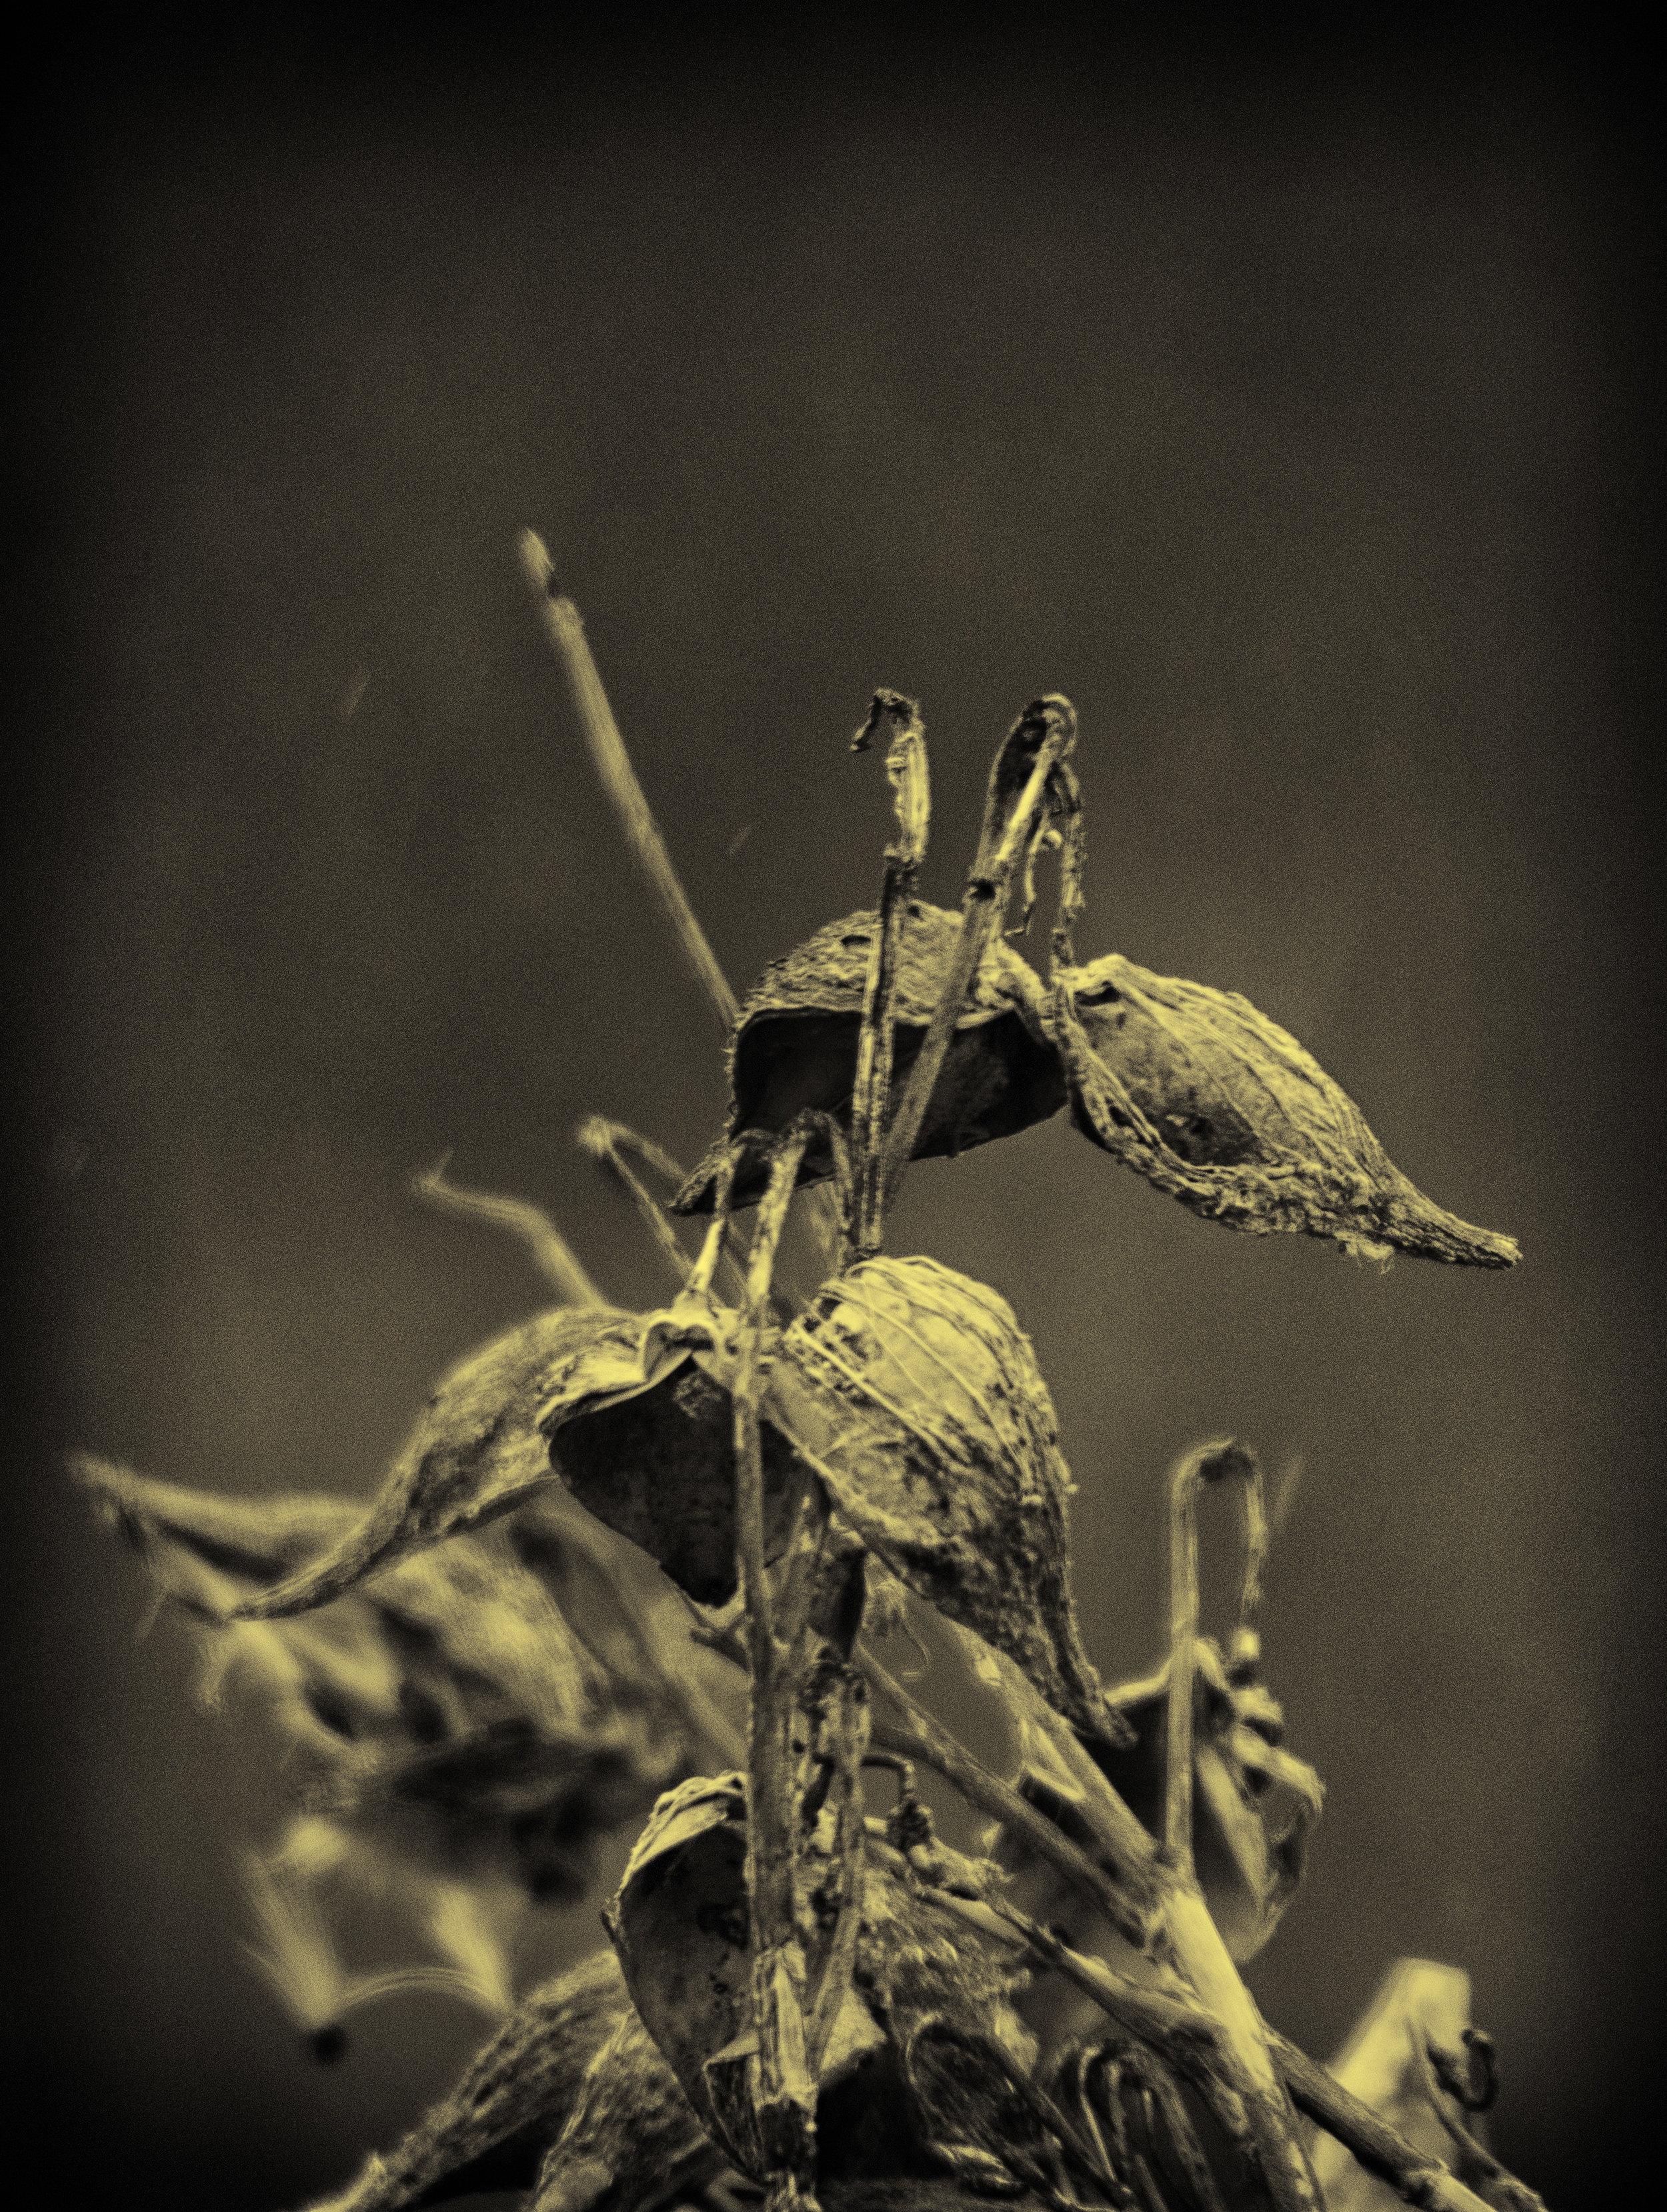 Infrared Milkweed